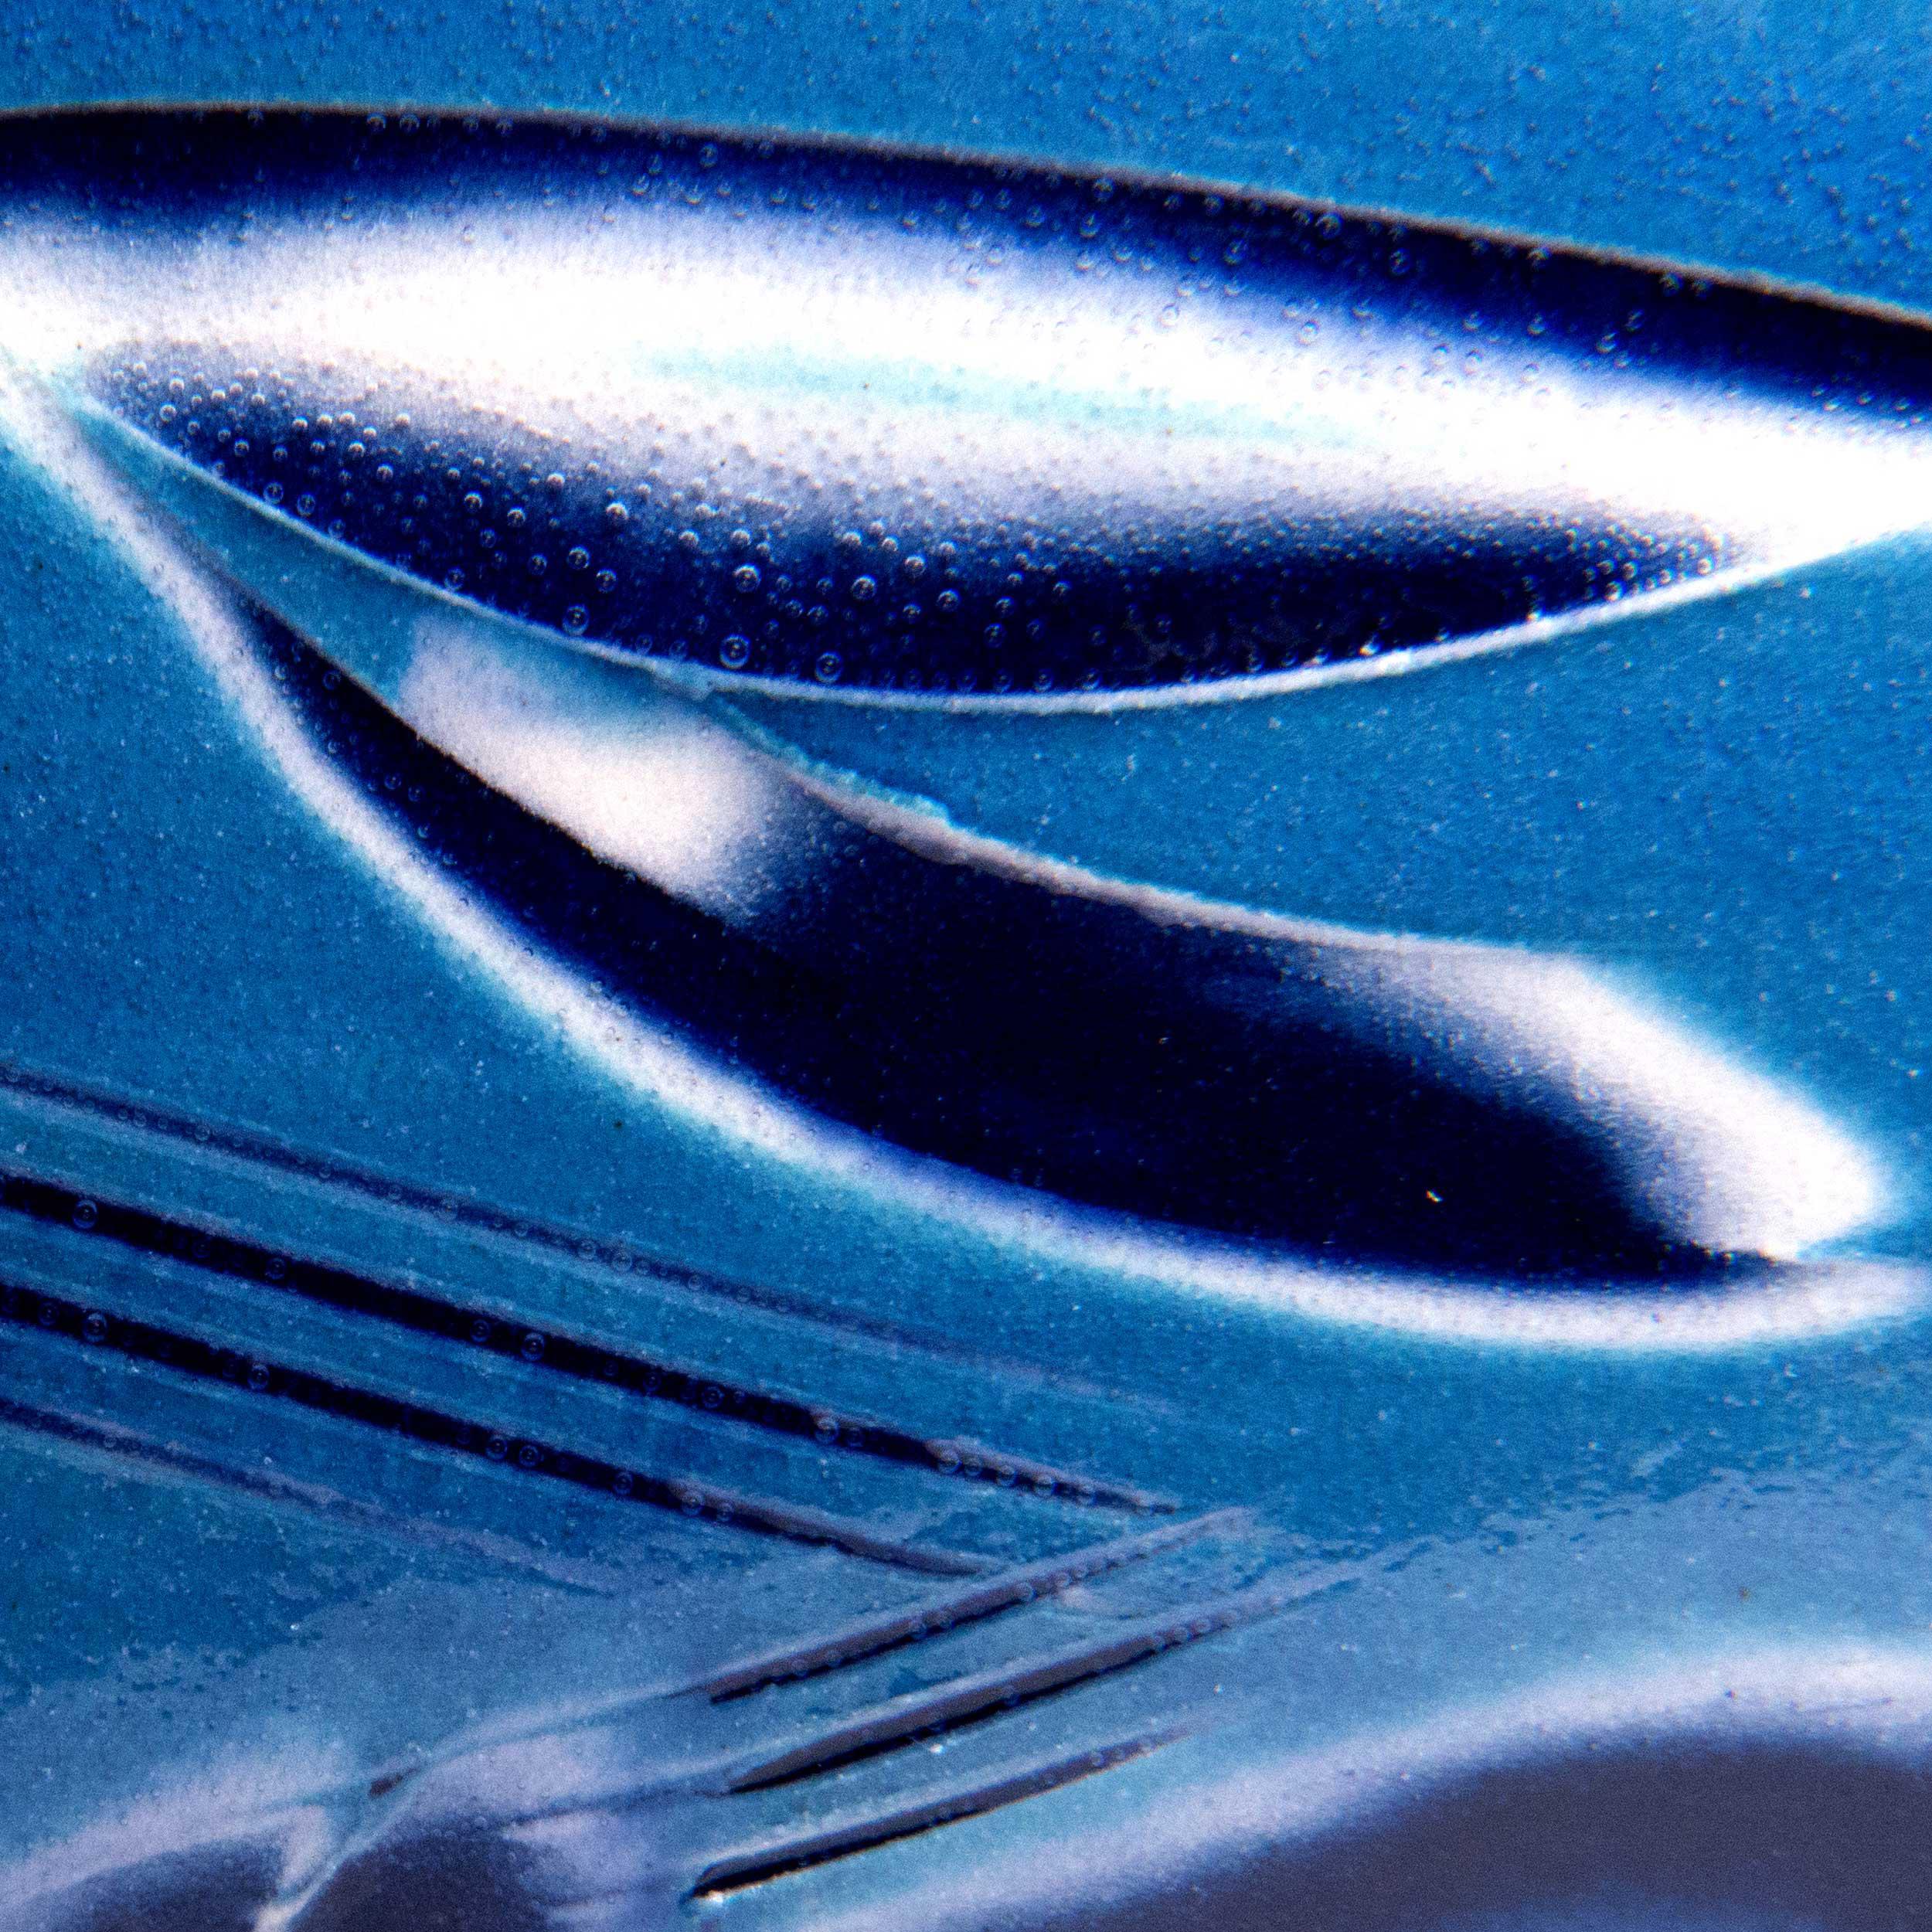 Cobalt Blue Ceramic Slipware by Rowena Gilbert